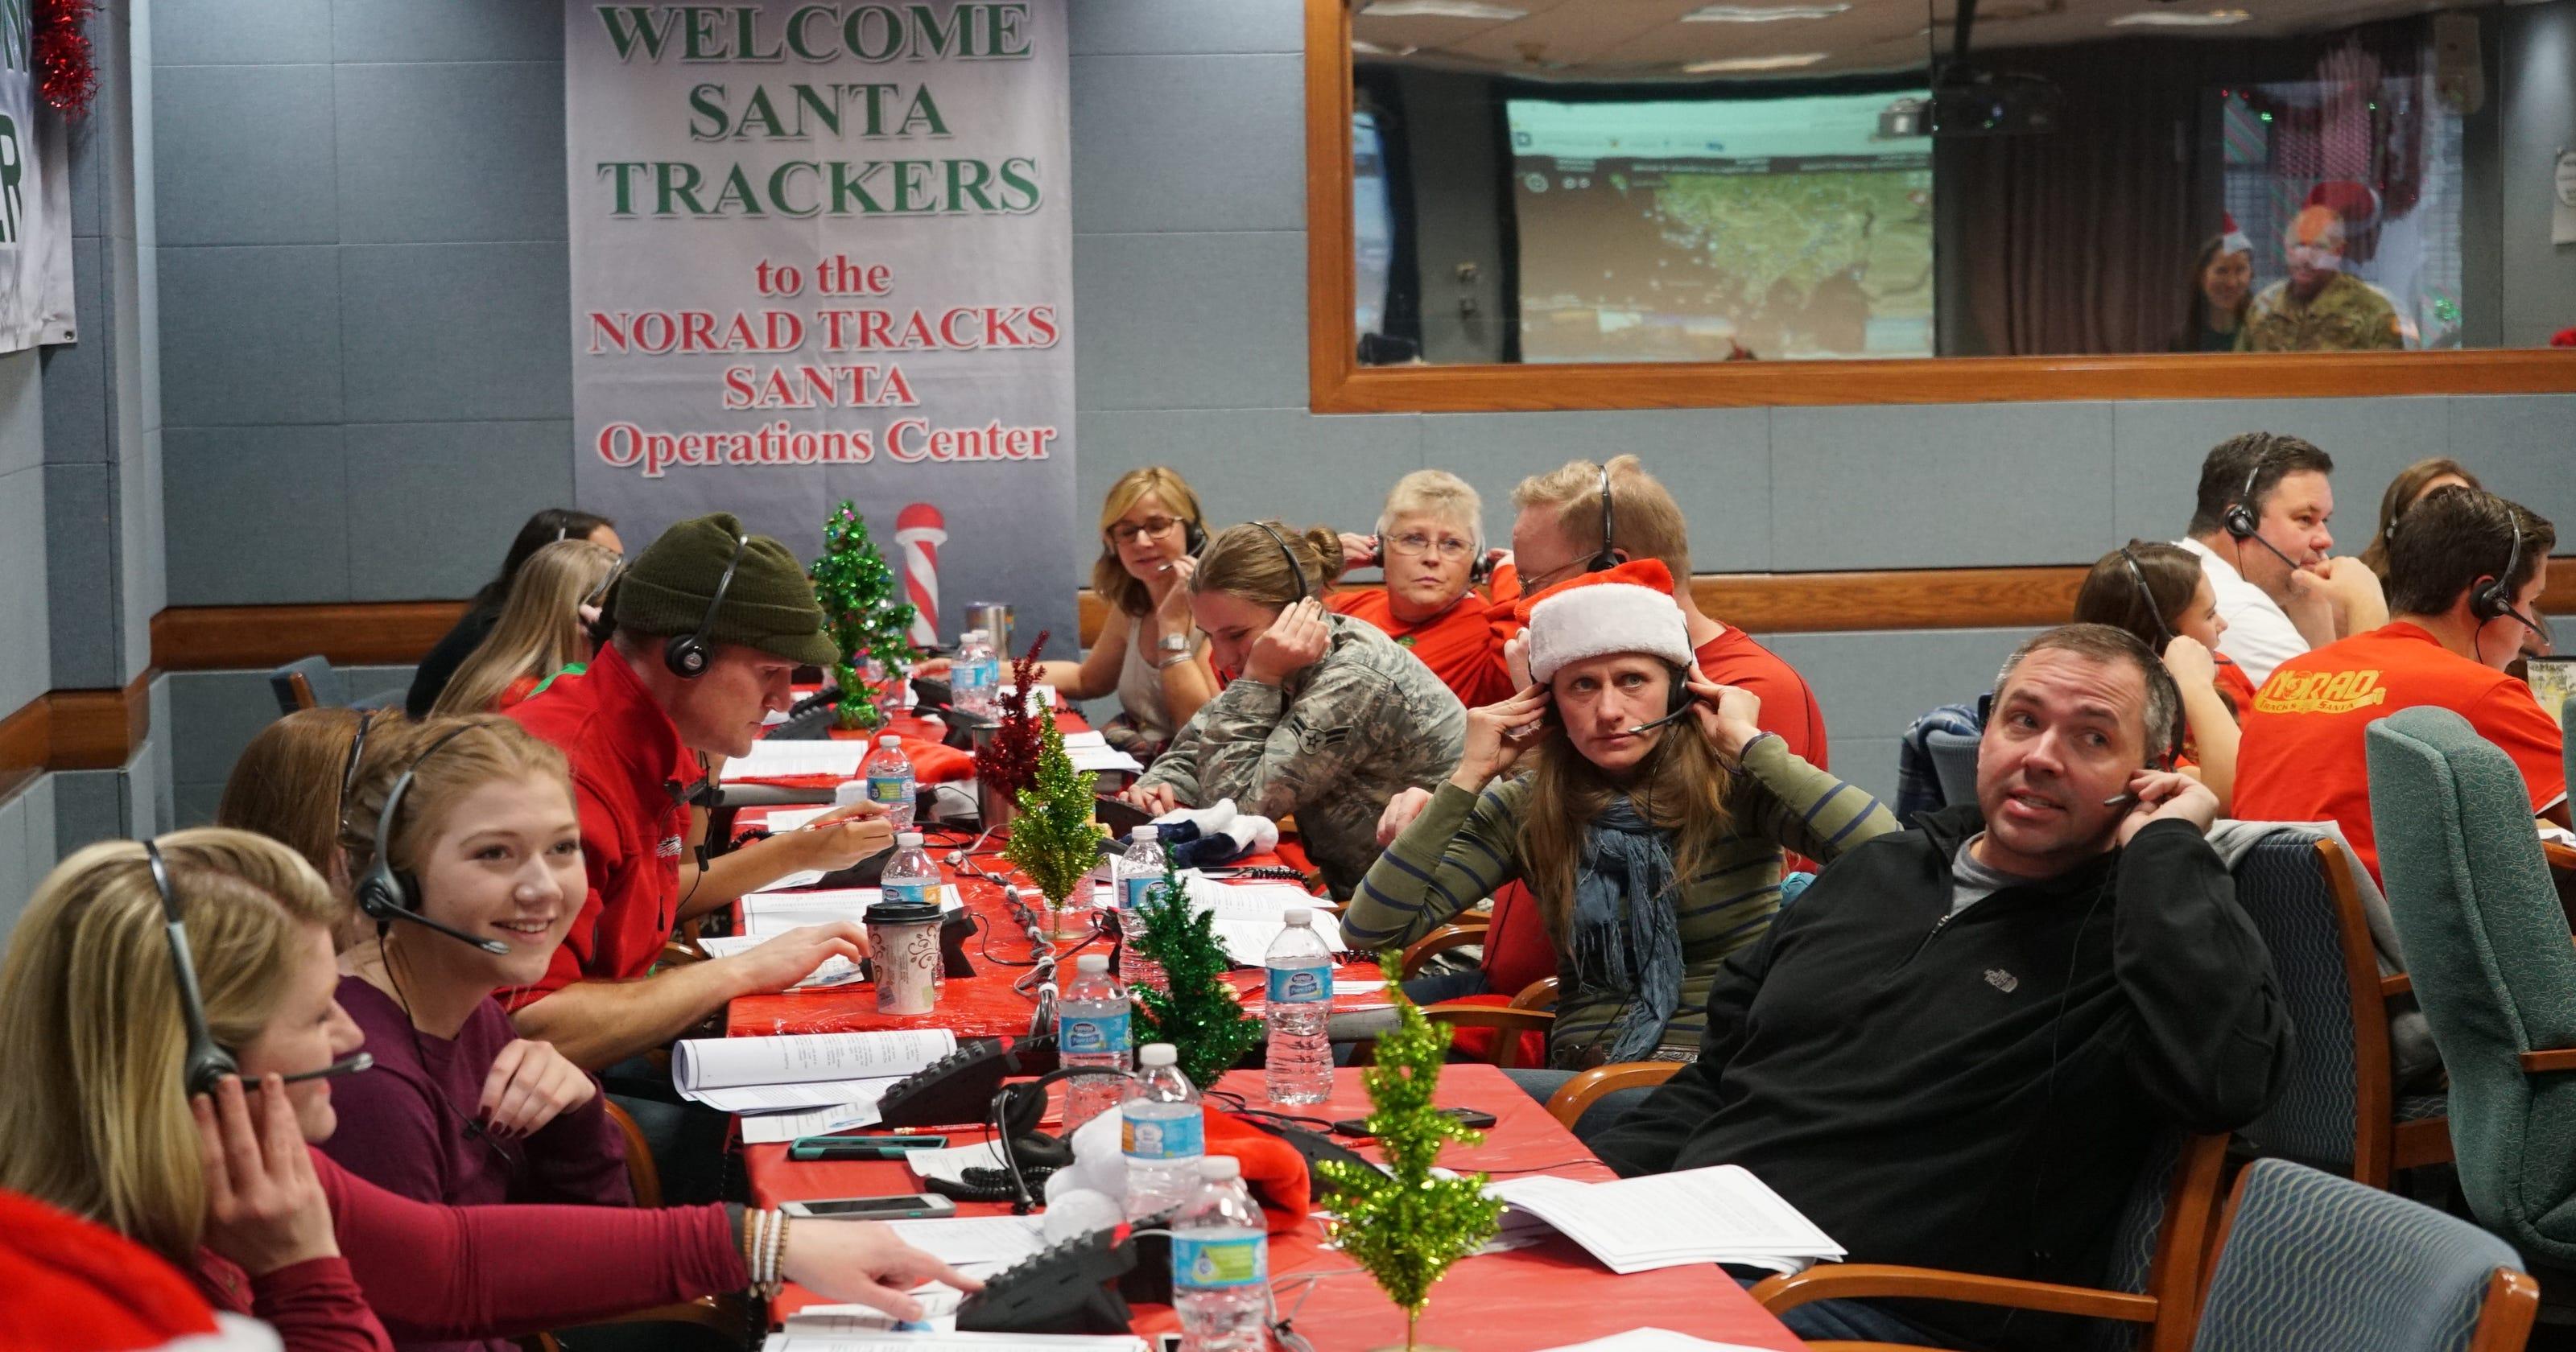 Tracking Santa: How NORAD brings Christmas joy to kids everywhere